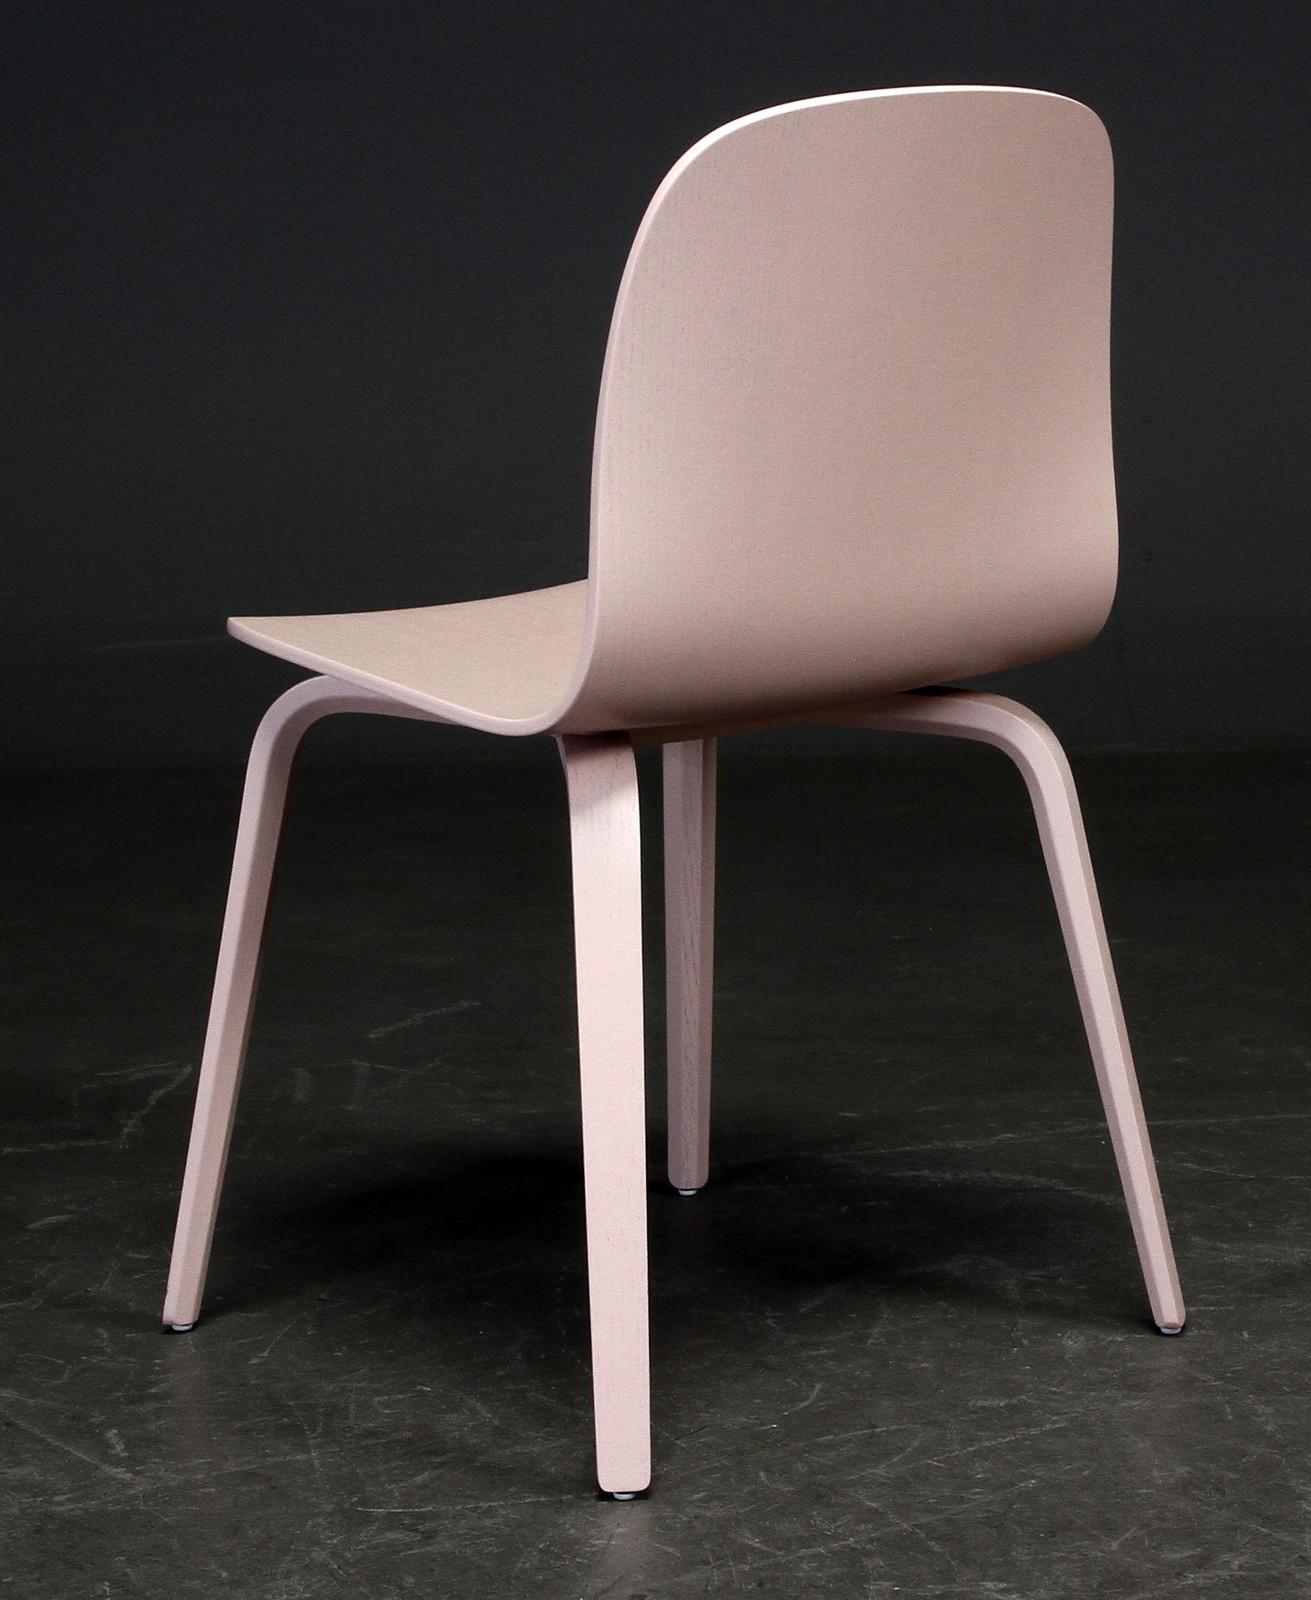 Mika Tolvanen, 'Visu. Chair', spisestuestol |